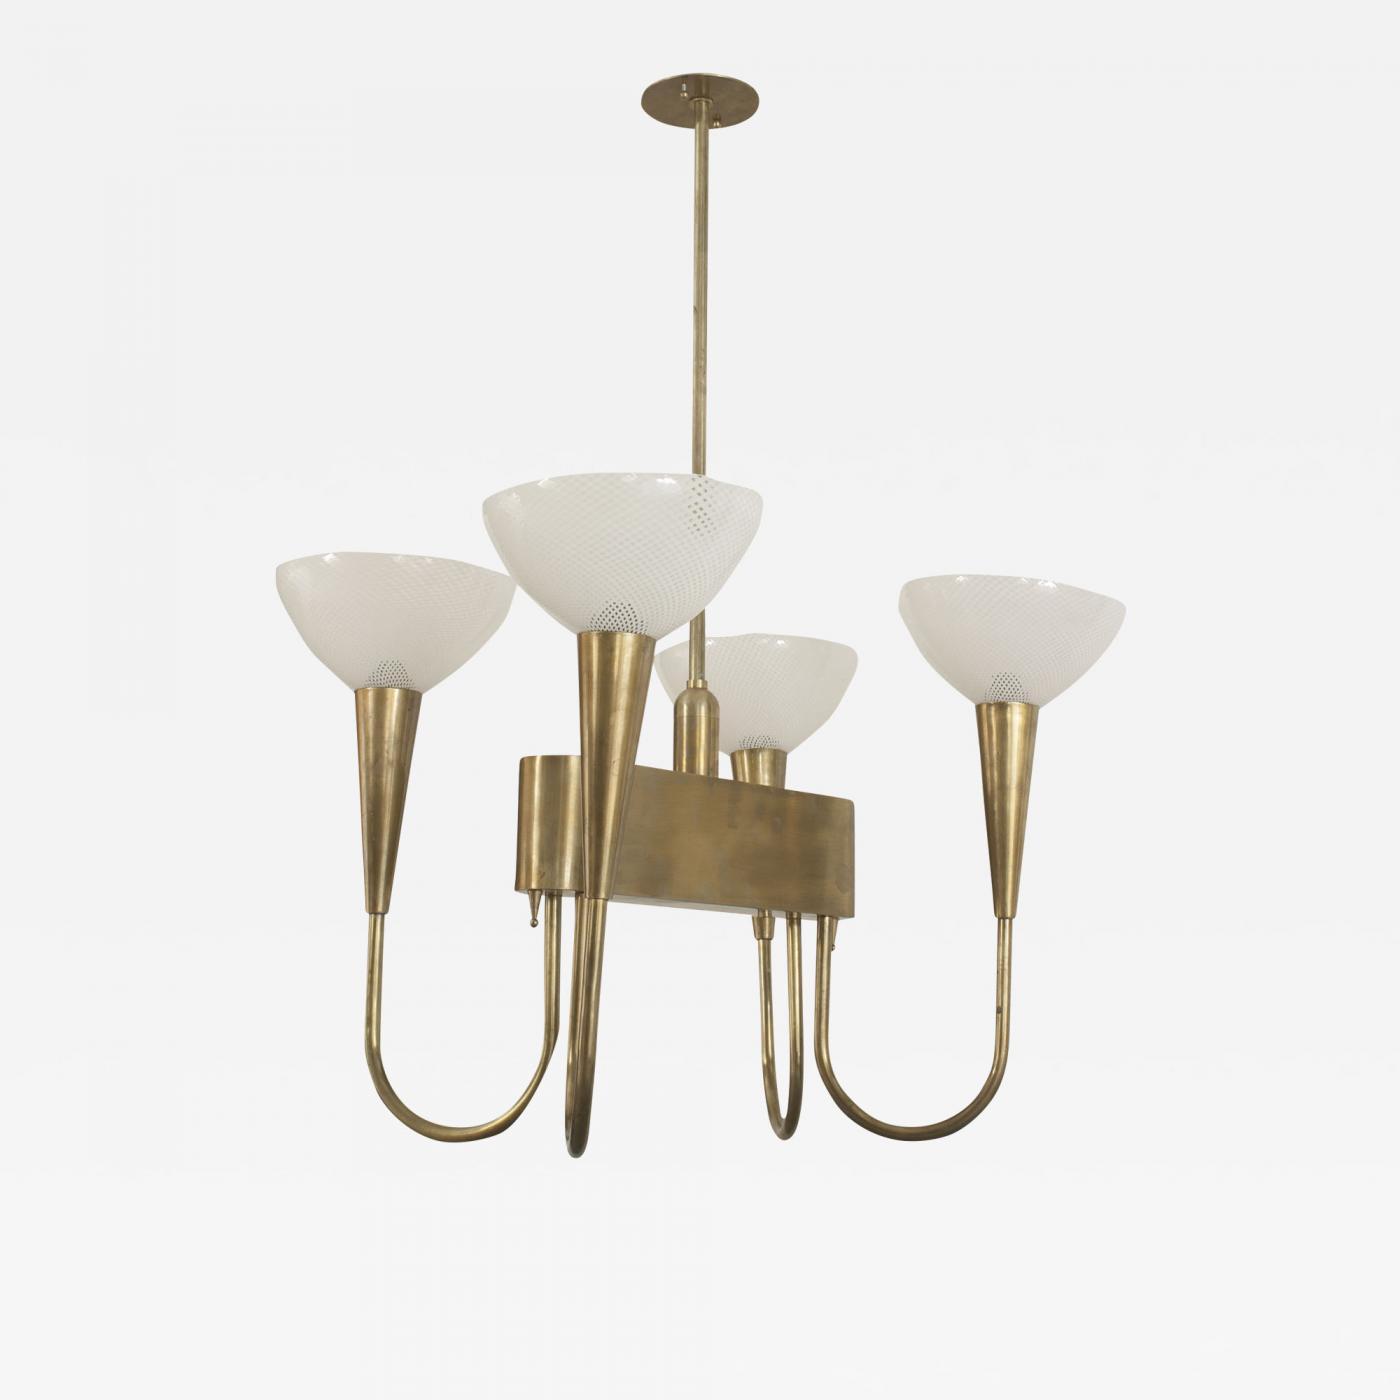 Venini italian 1940s brass chandelier listings furniture lighting chandeliers and pendants aloadofball Image collections